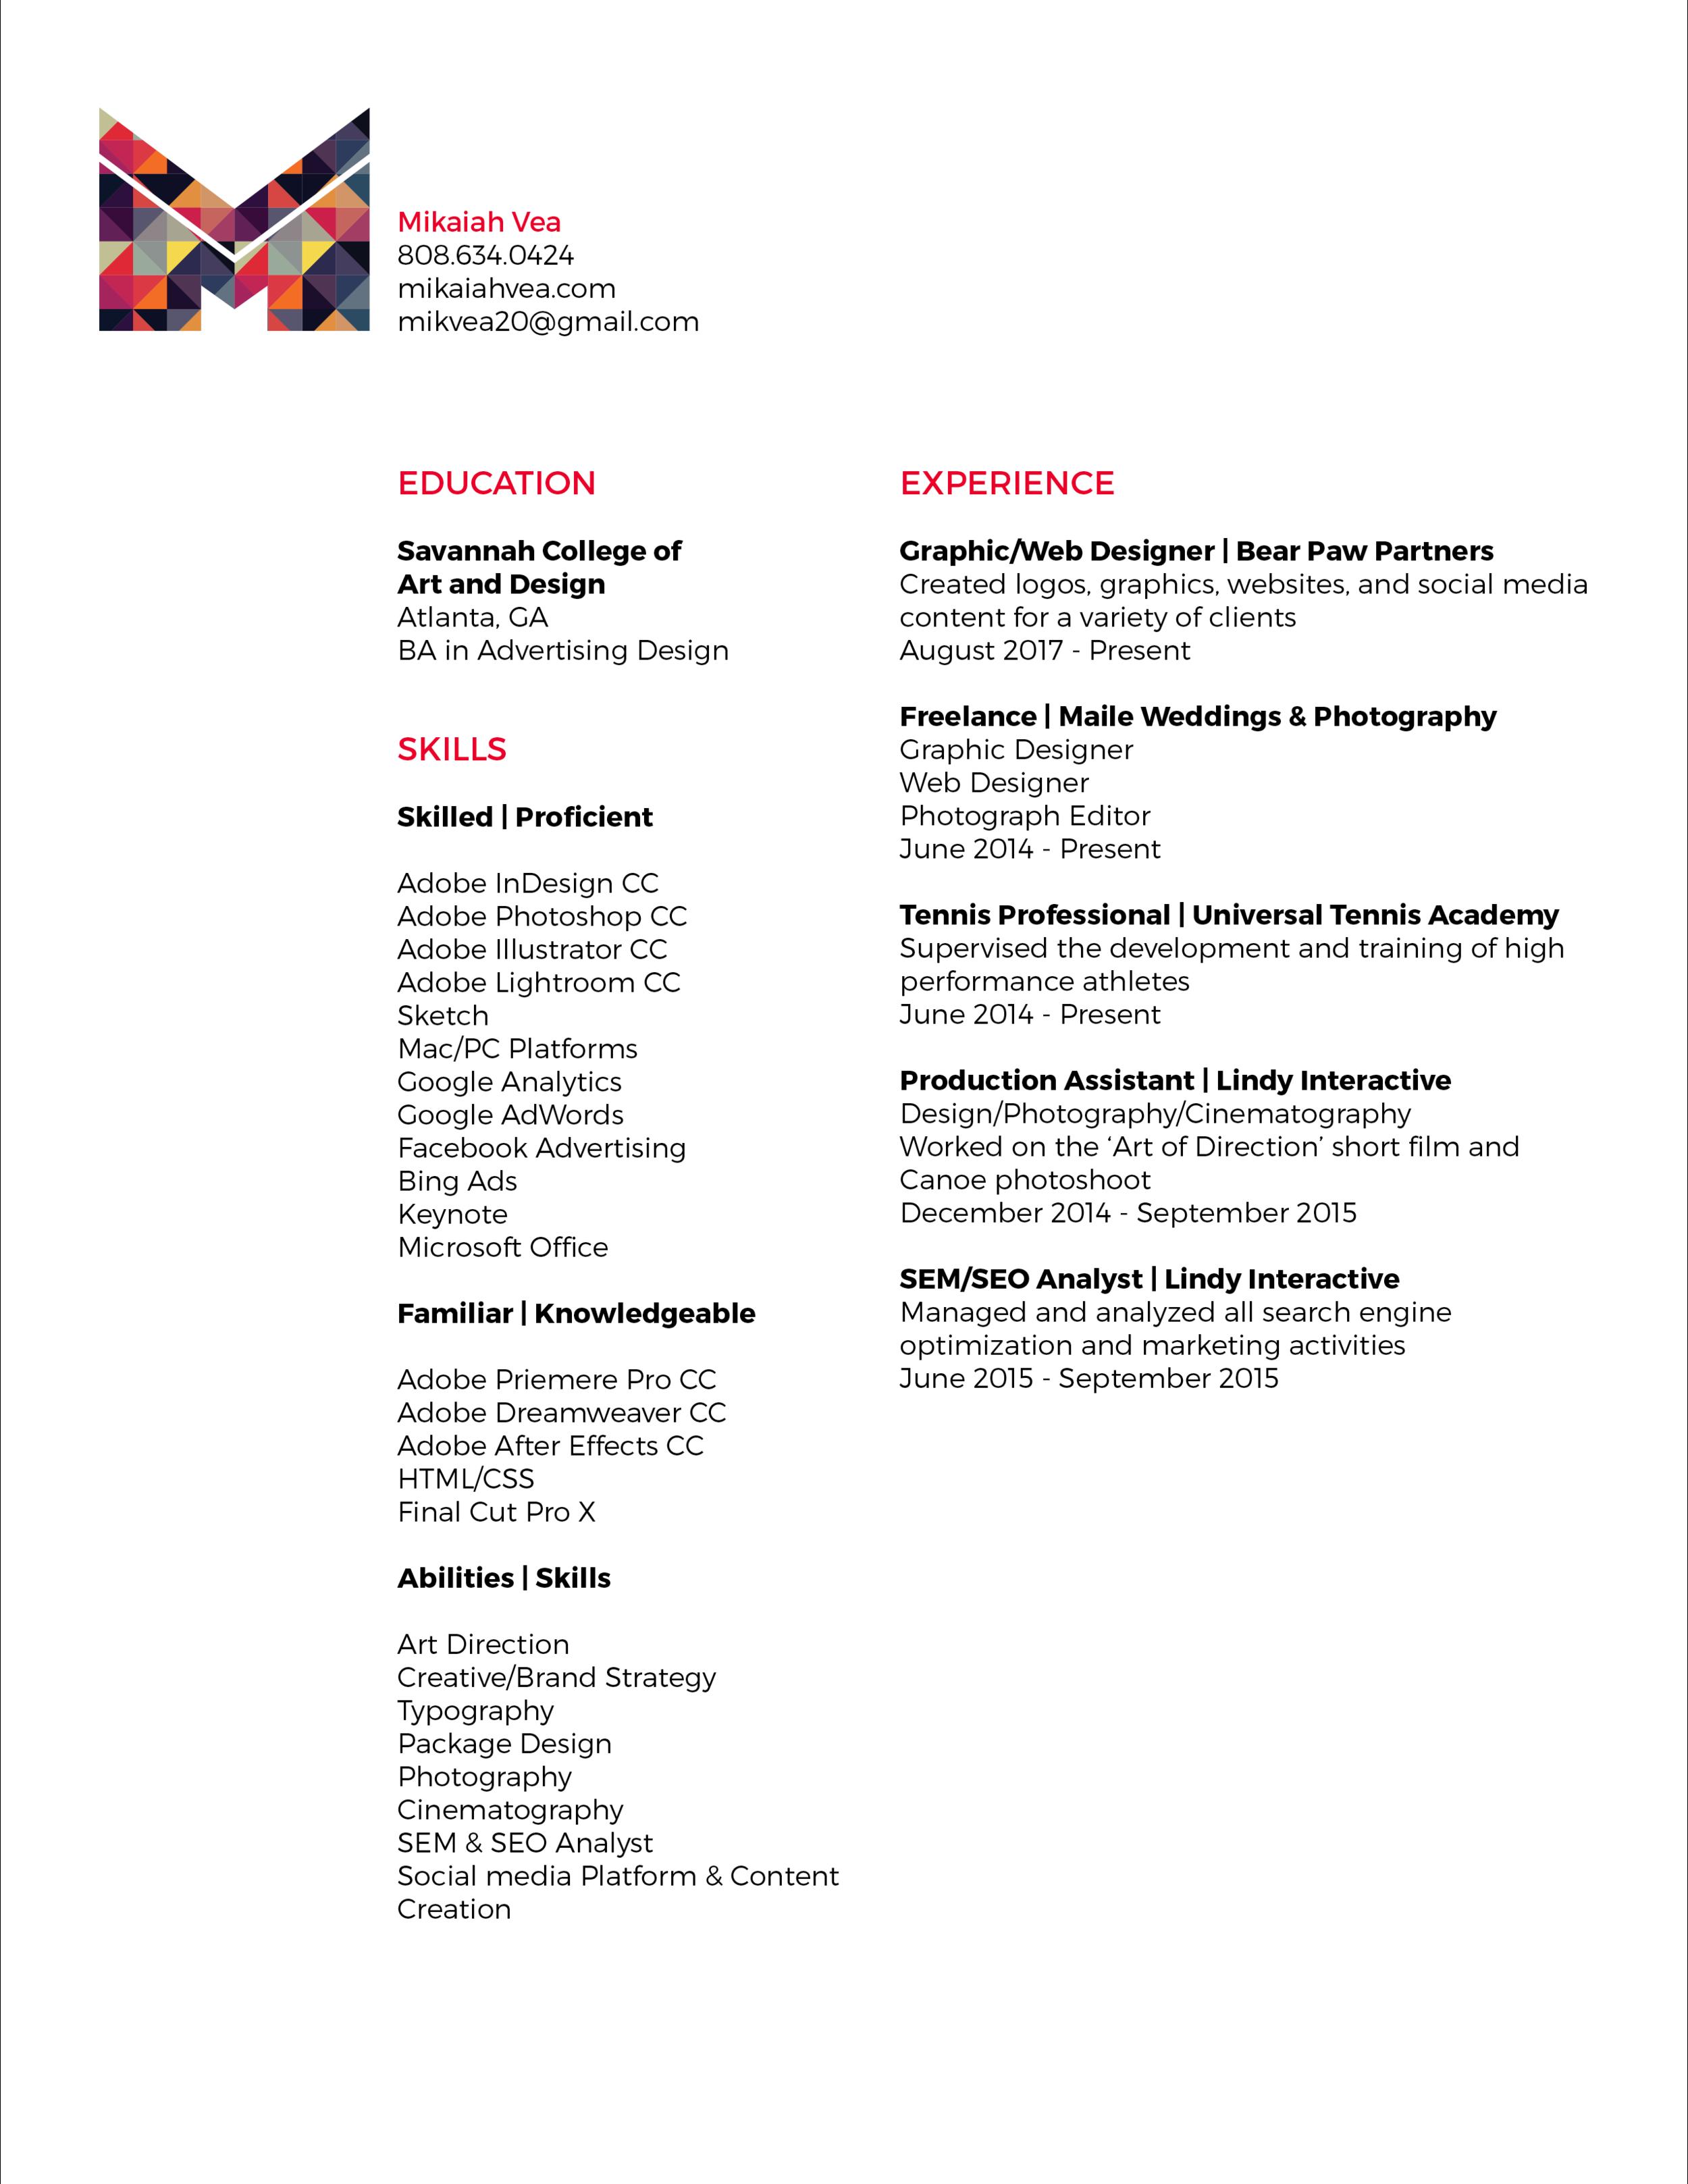 Mikaiah.Vea.Resume.2018.png